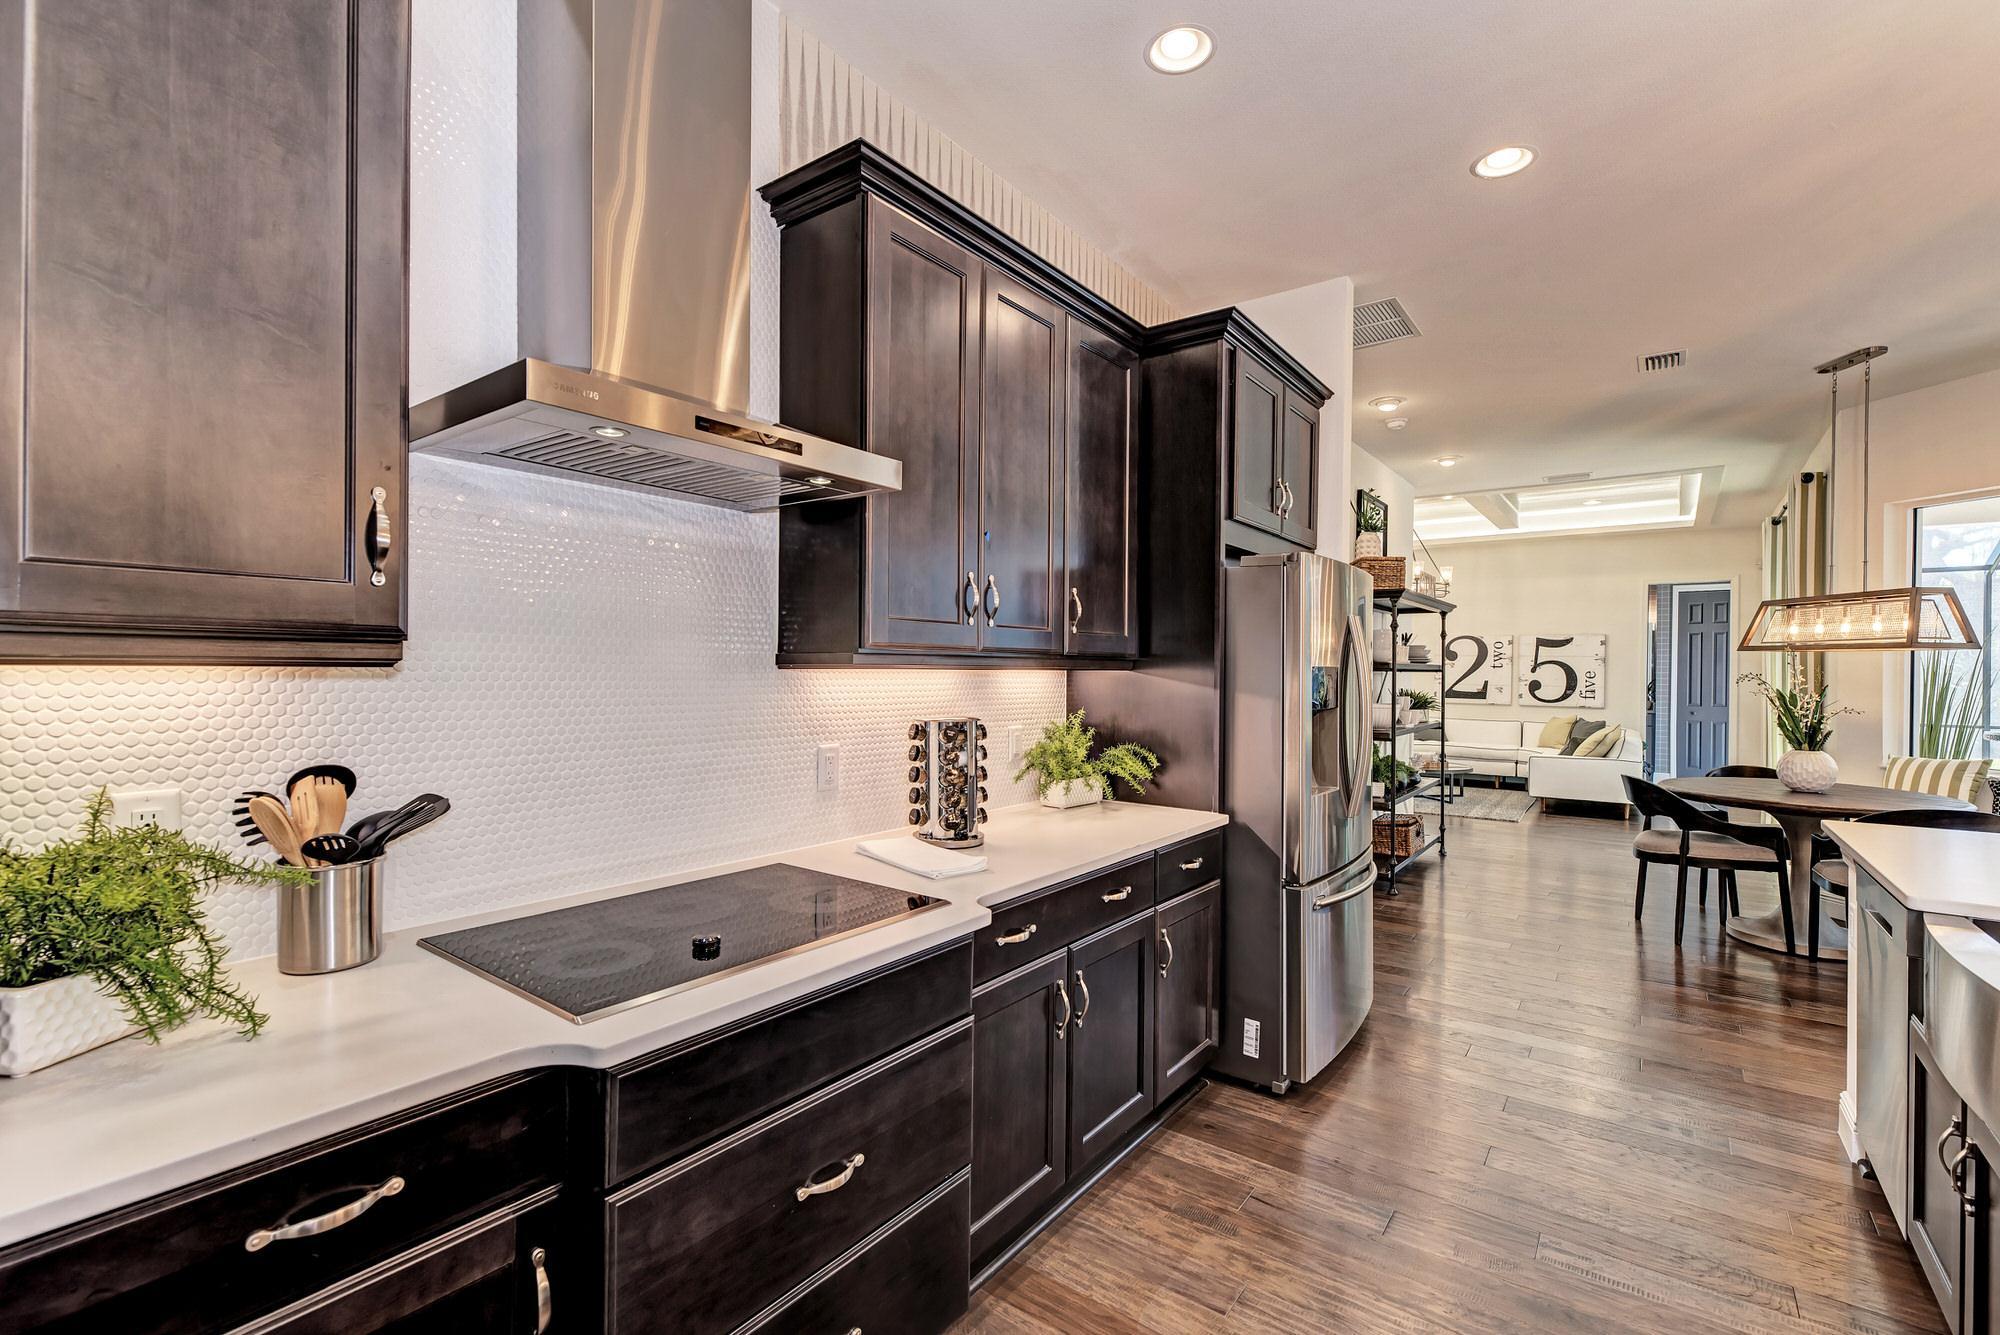 Kitchen featured in the Aruba 3 Car Garage By Medallion Home in Sarasota-Bradenton, FL